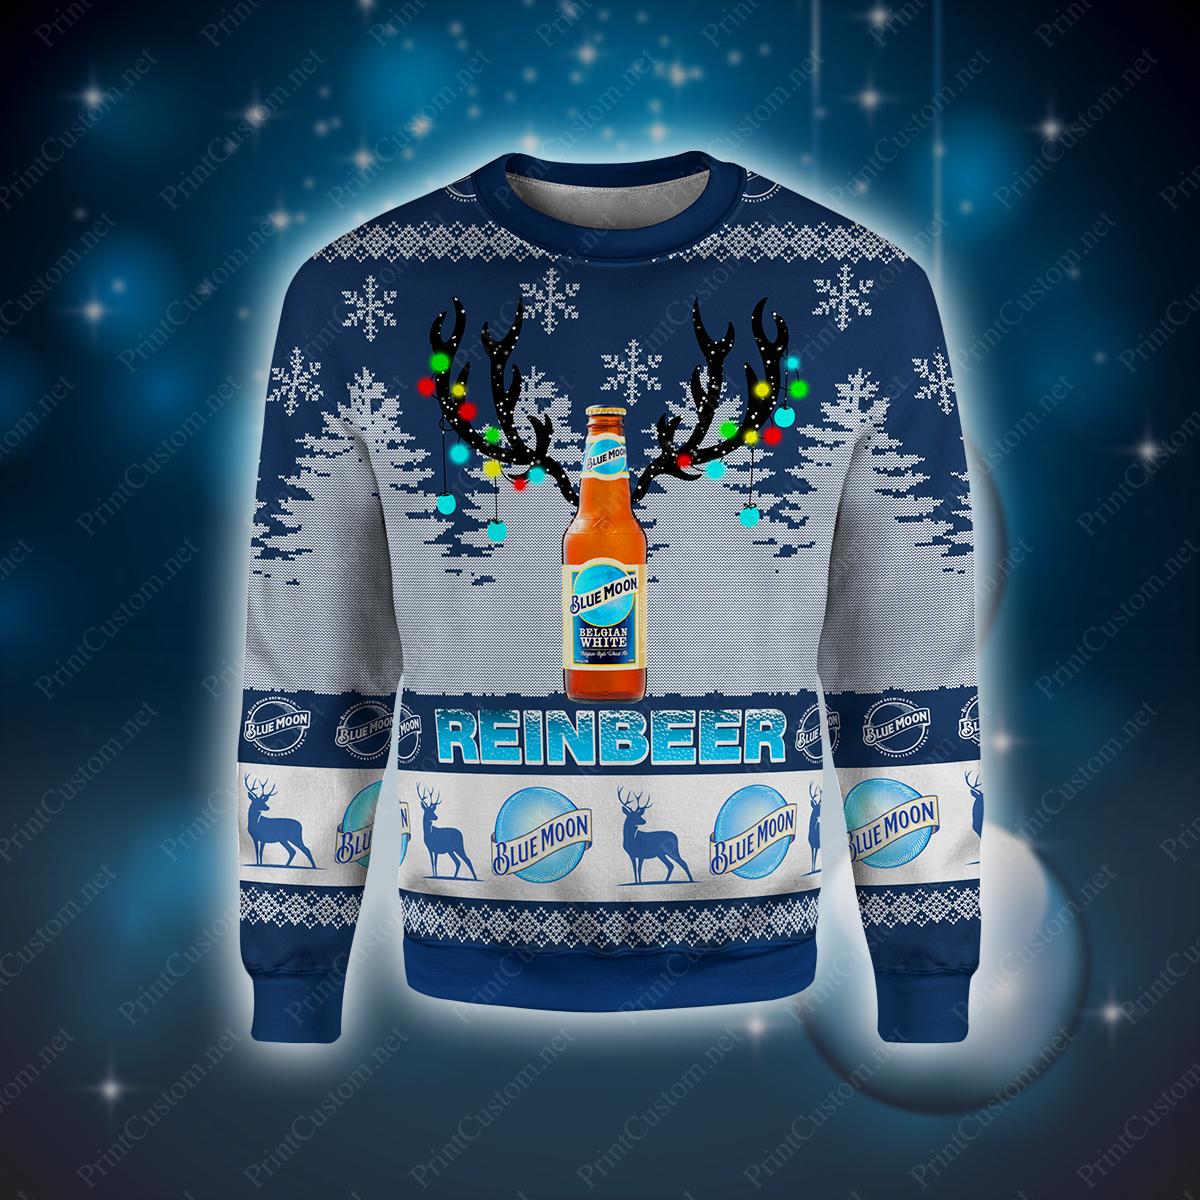 Reinbeer blue moon full printing ugly christmas sweater 2